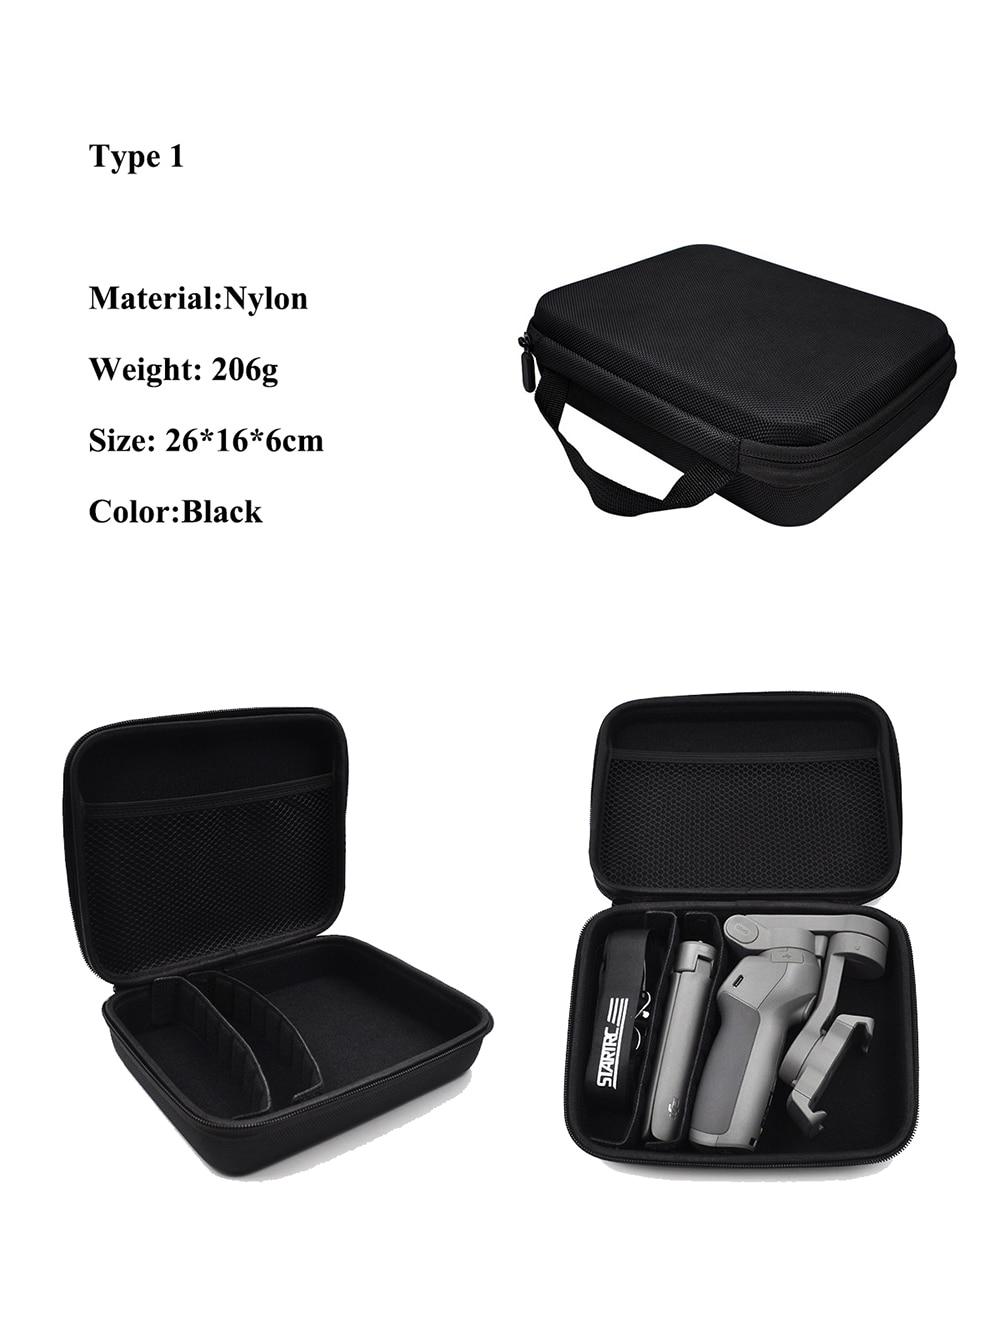 STARTRC Osmo Mobile 3 Carry Case Portable Mini Hard Travel Storage Bag PU M0I5